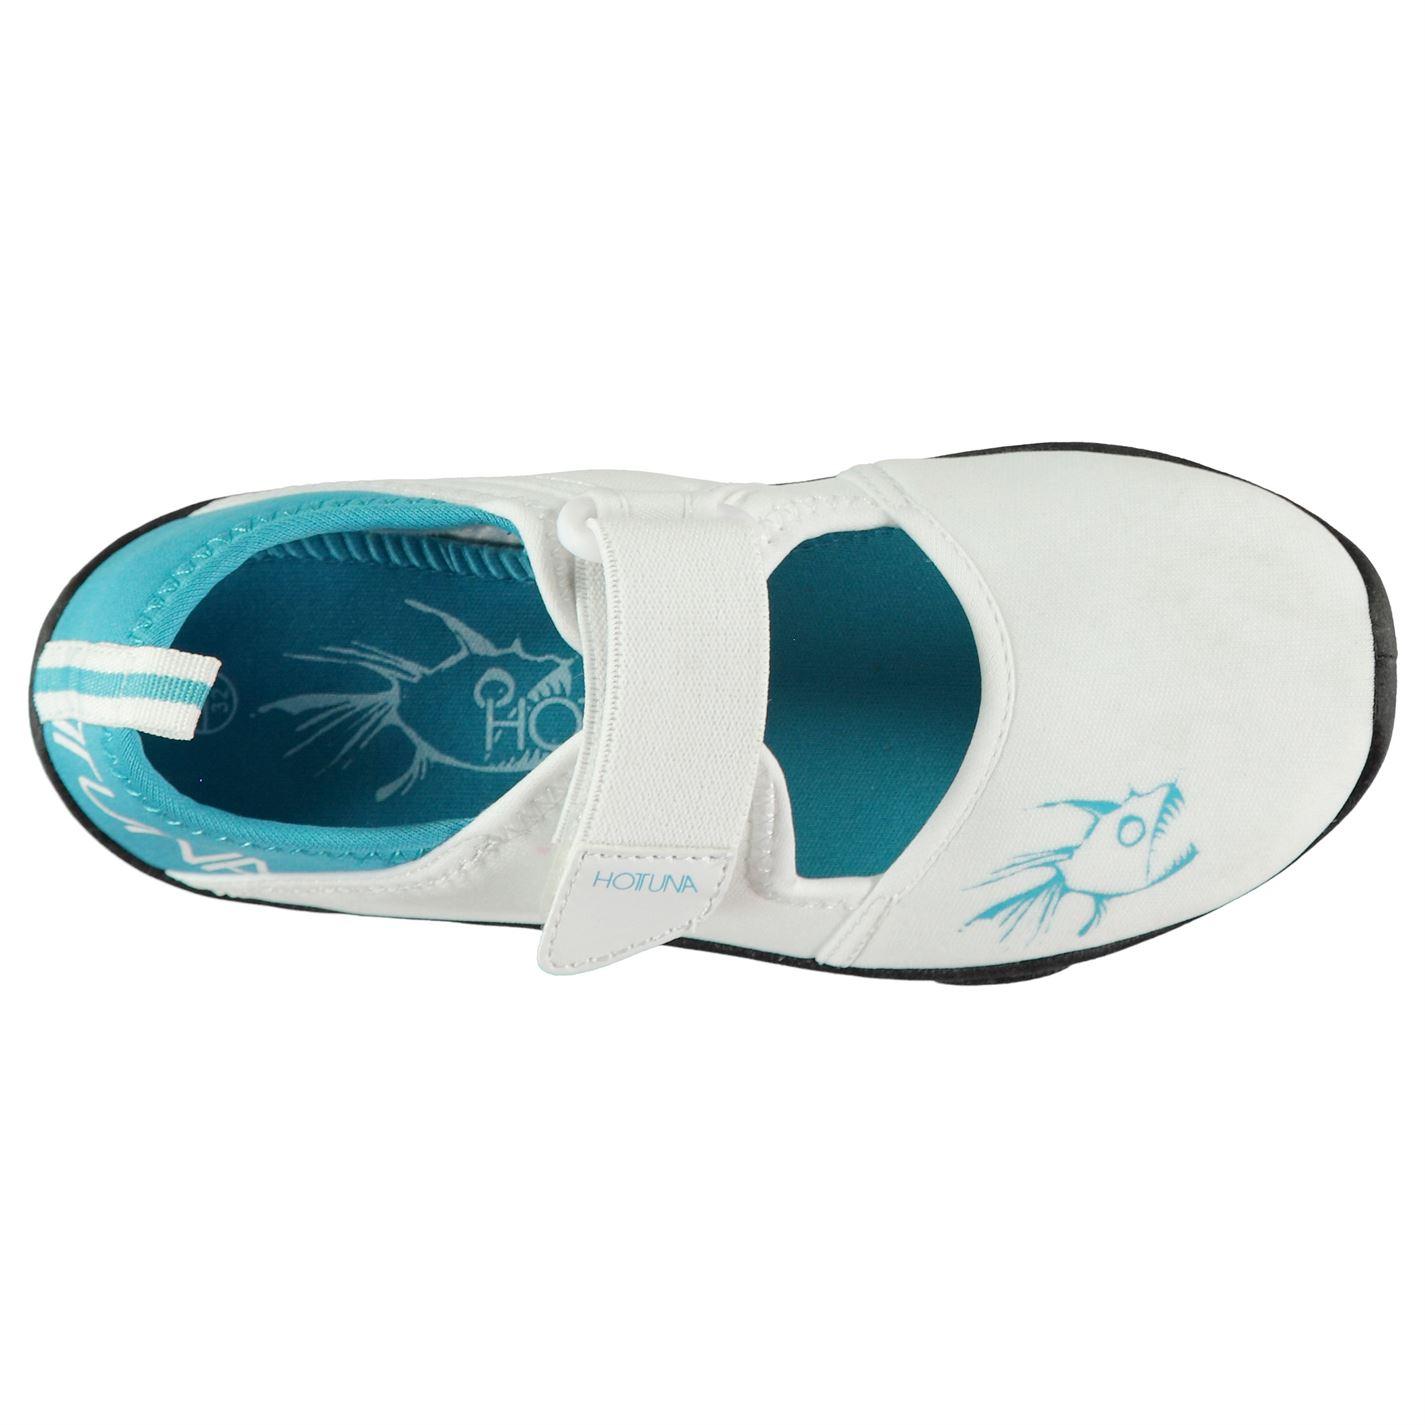 7ada69c3dd16 Hot-Tuna-Kids-Childrens-Aqua-Shoes-Splasher thumbnail 13